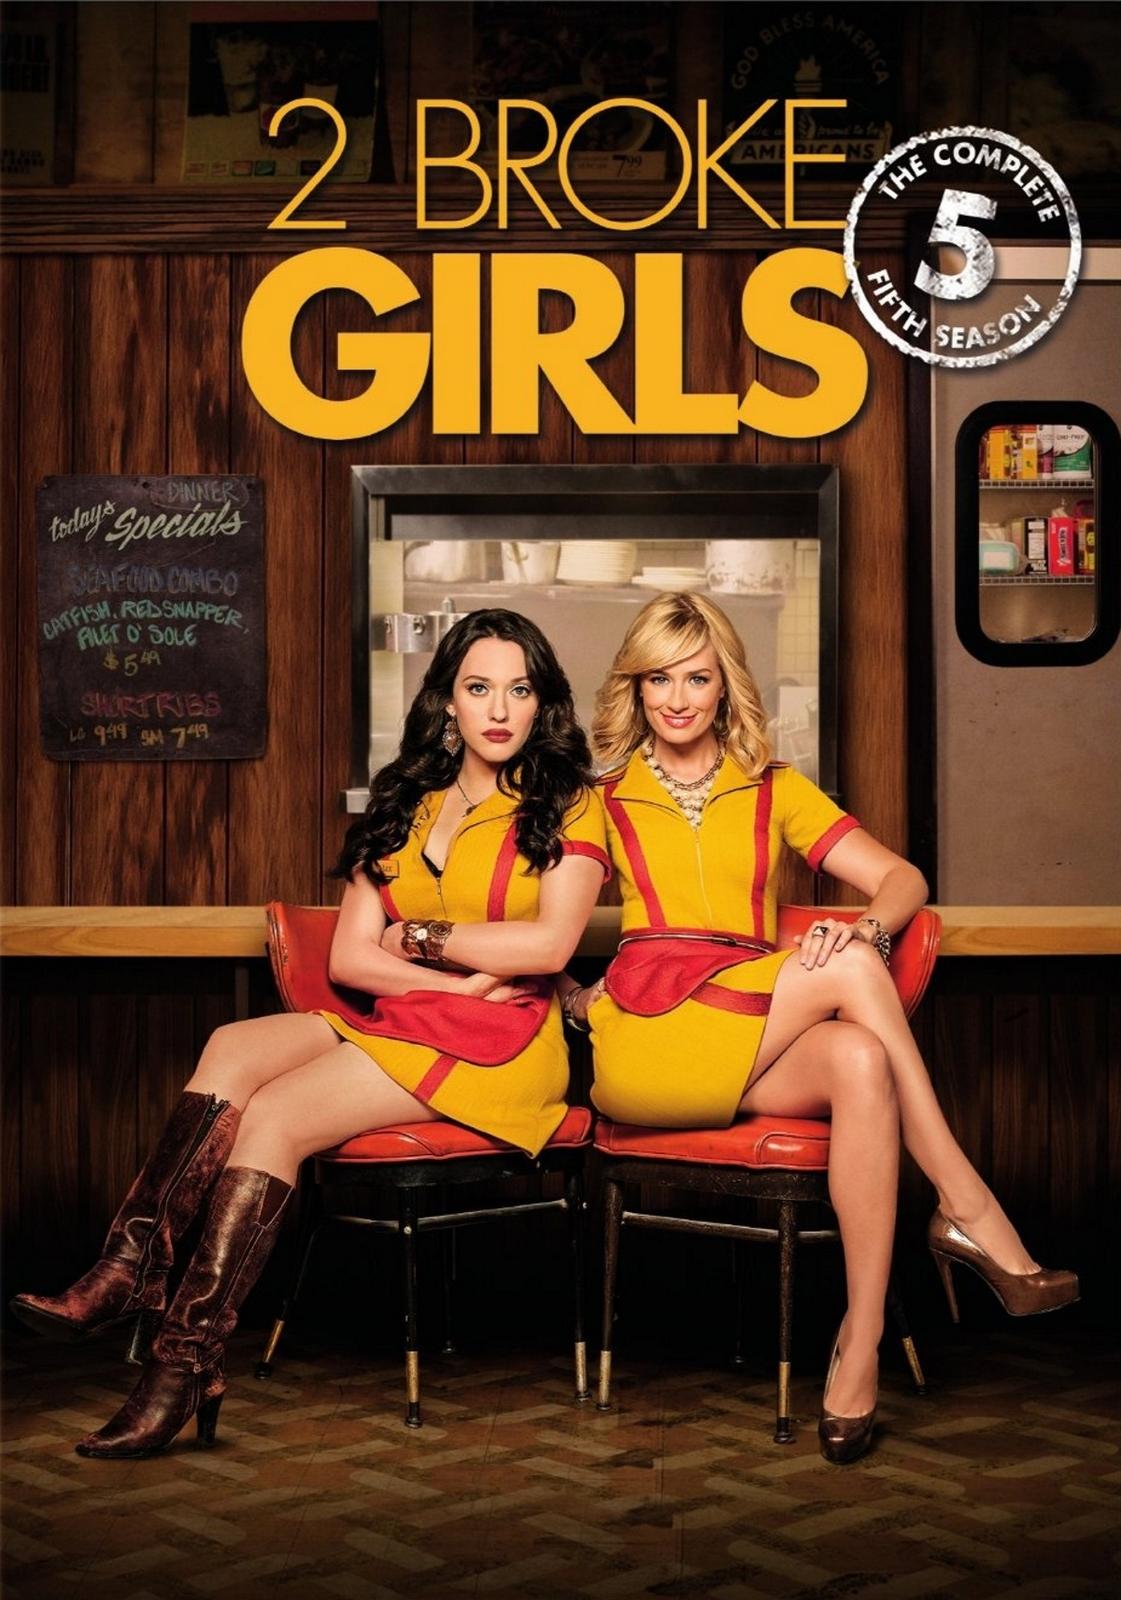 2 broke girls the complete fifth season five 5  dvd  2016  3 disc set